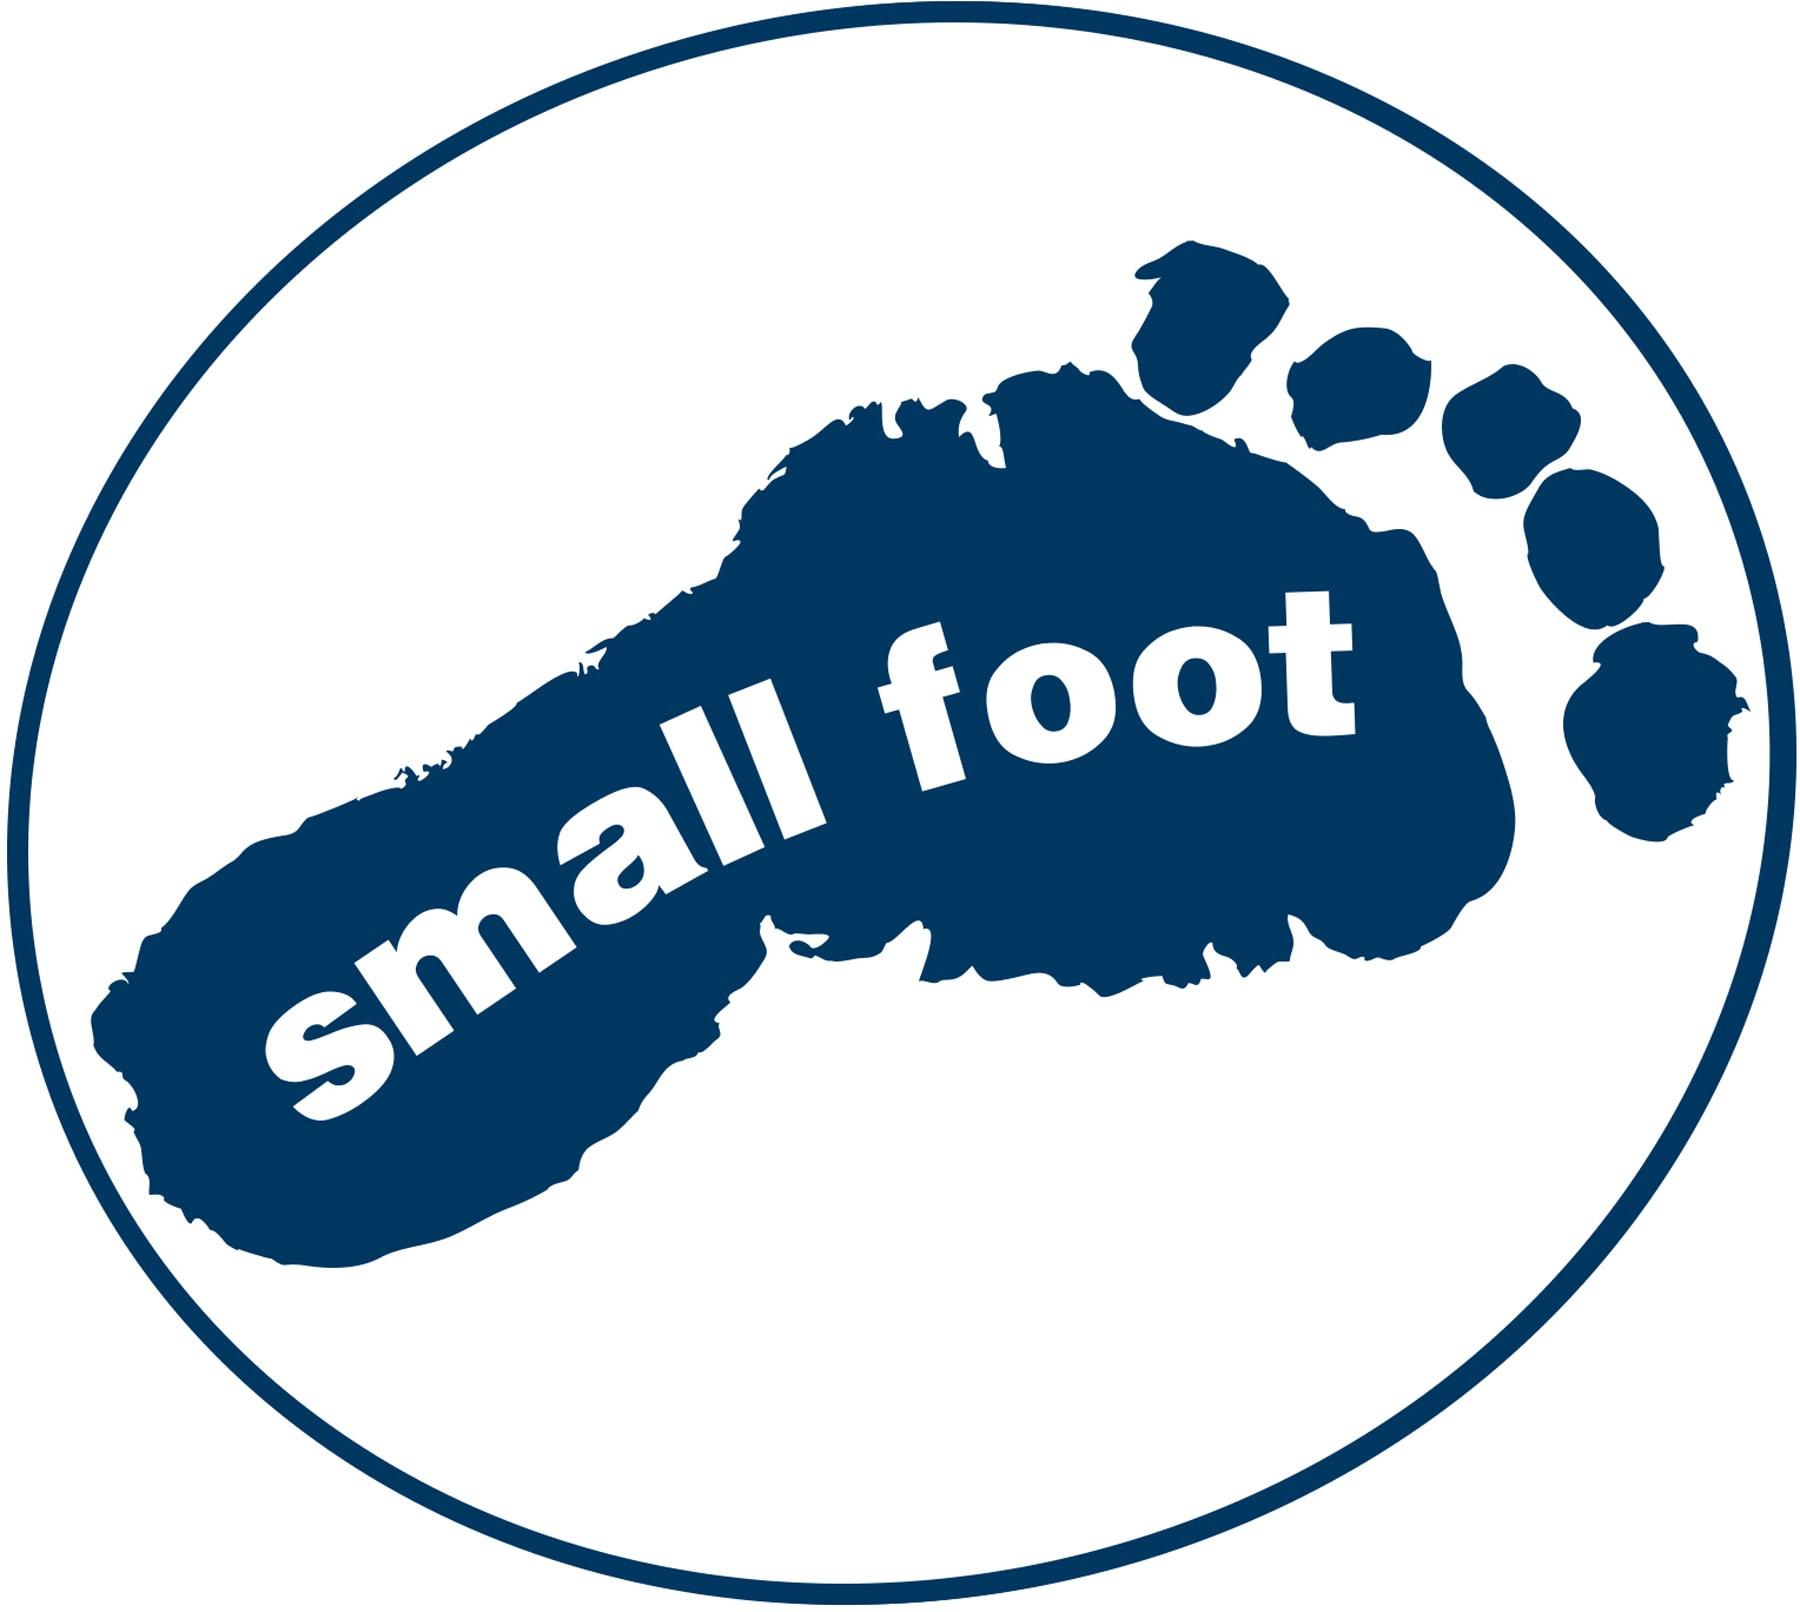 small_foot